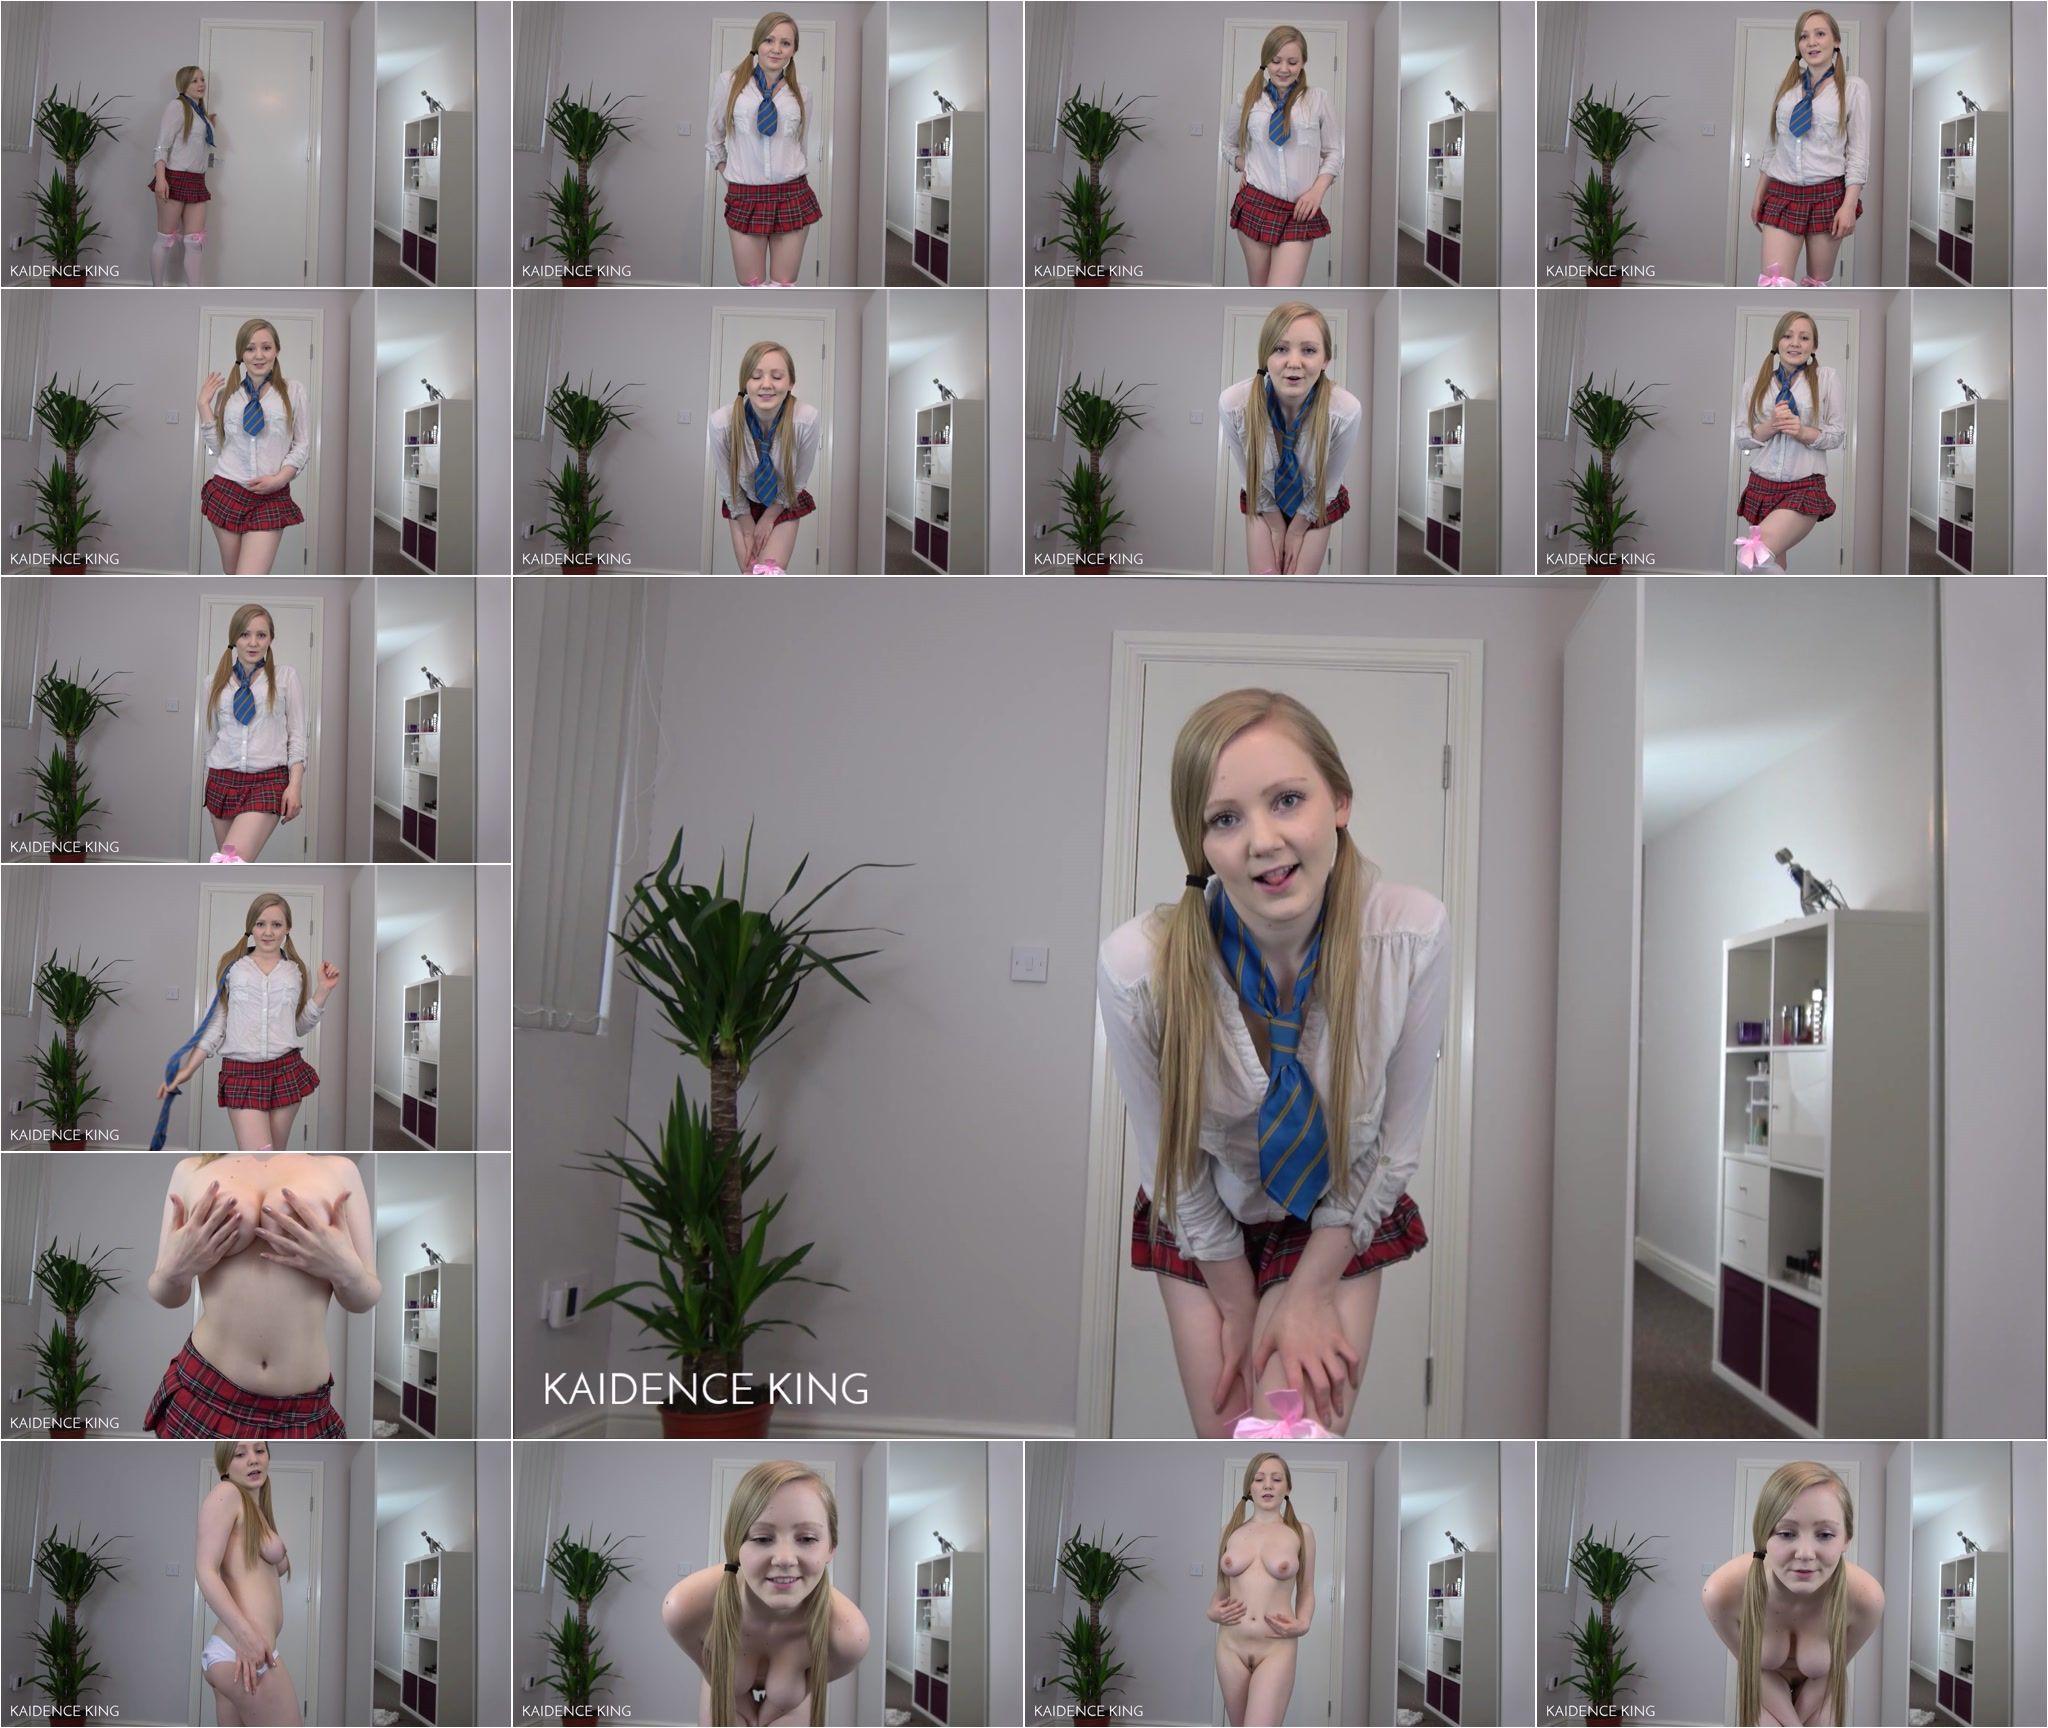 Kaidence King   Schoolgirl Daddy Ageplay Joi  Clips4sale  Hd 1080p.ScrinList - Kaidence King   Schoolgirl Daddy Ageplay Joi [clips4sale] Hd 1080p